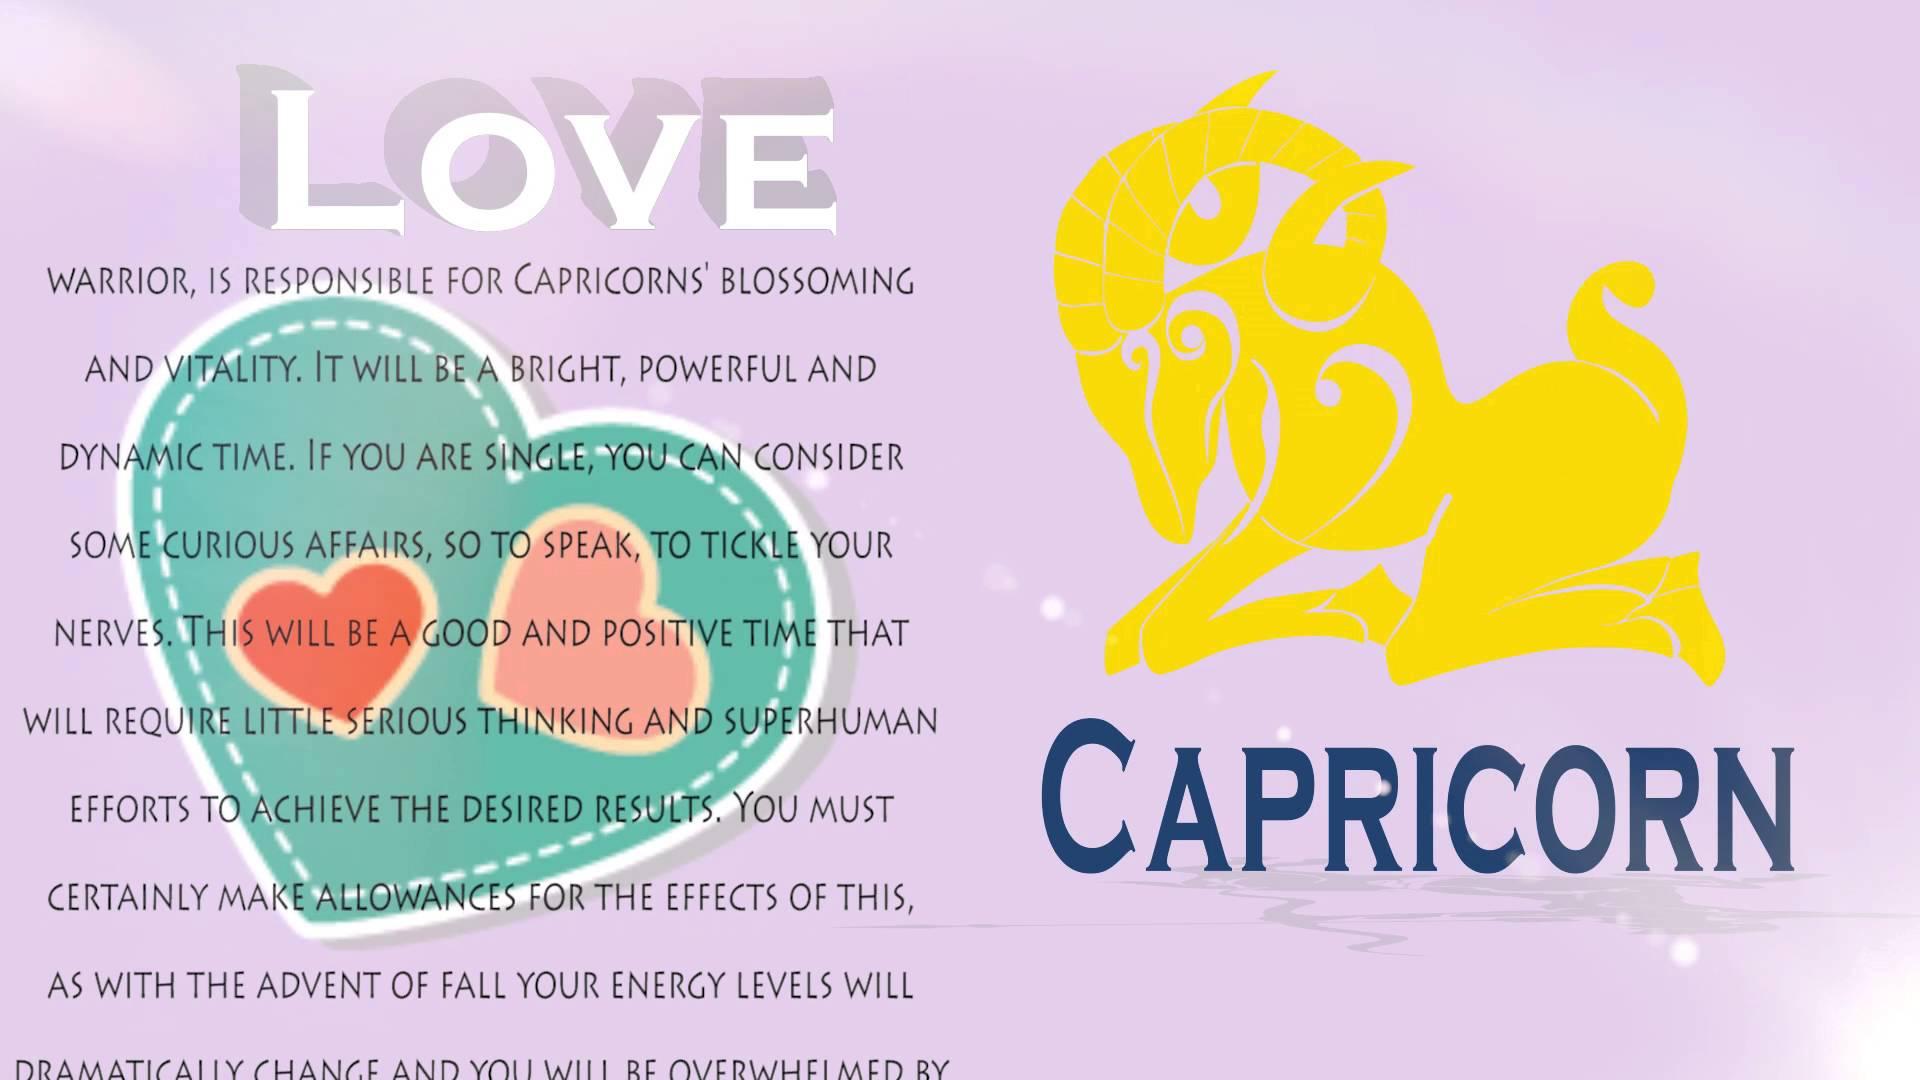 Capricorn 2016 Love horoscope - YouTube